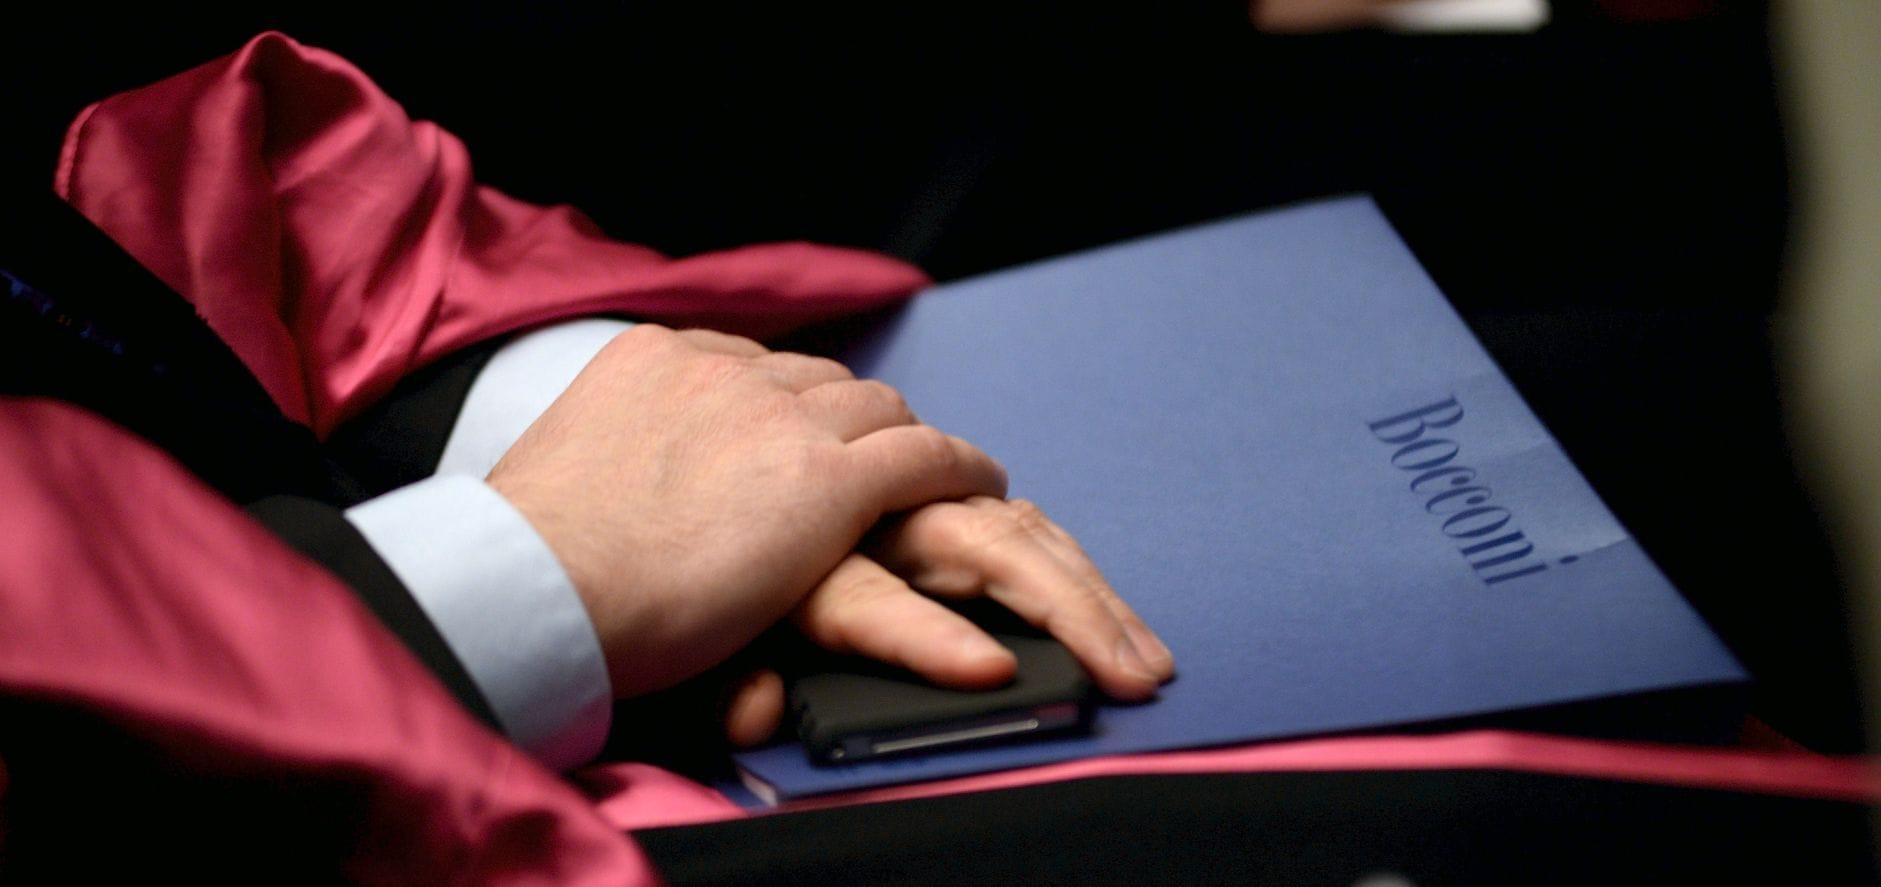 Inauguration Of The Academic Year At Bocconi University